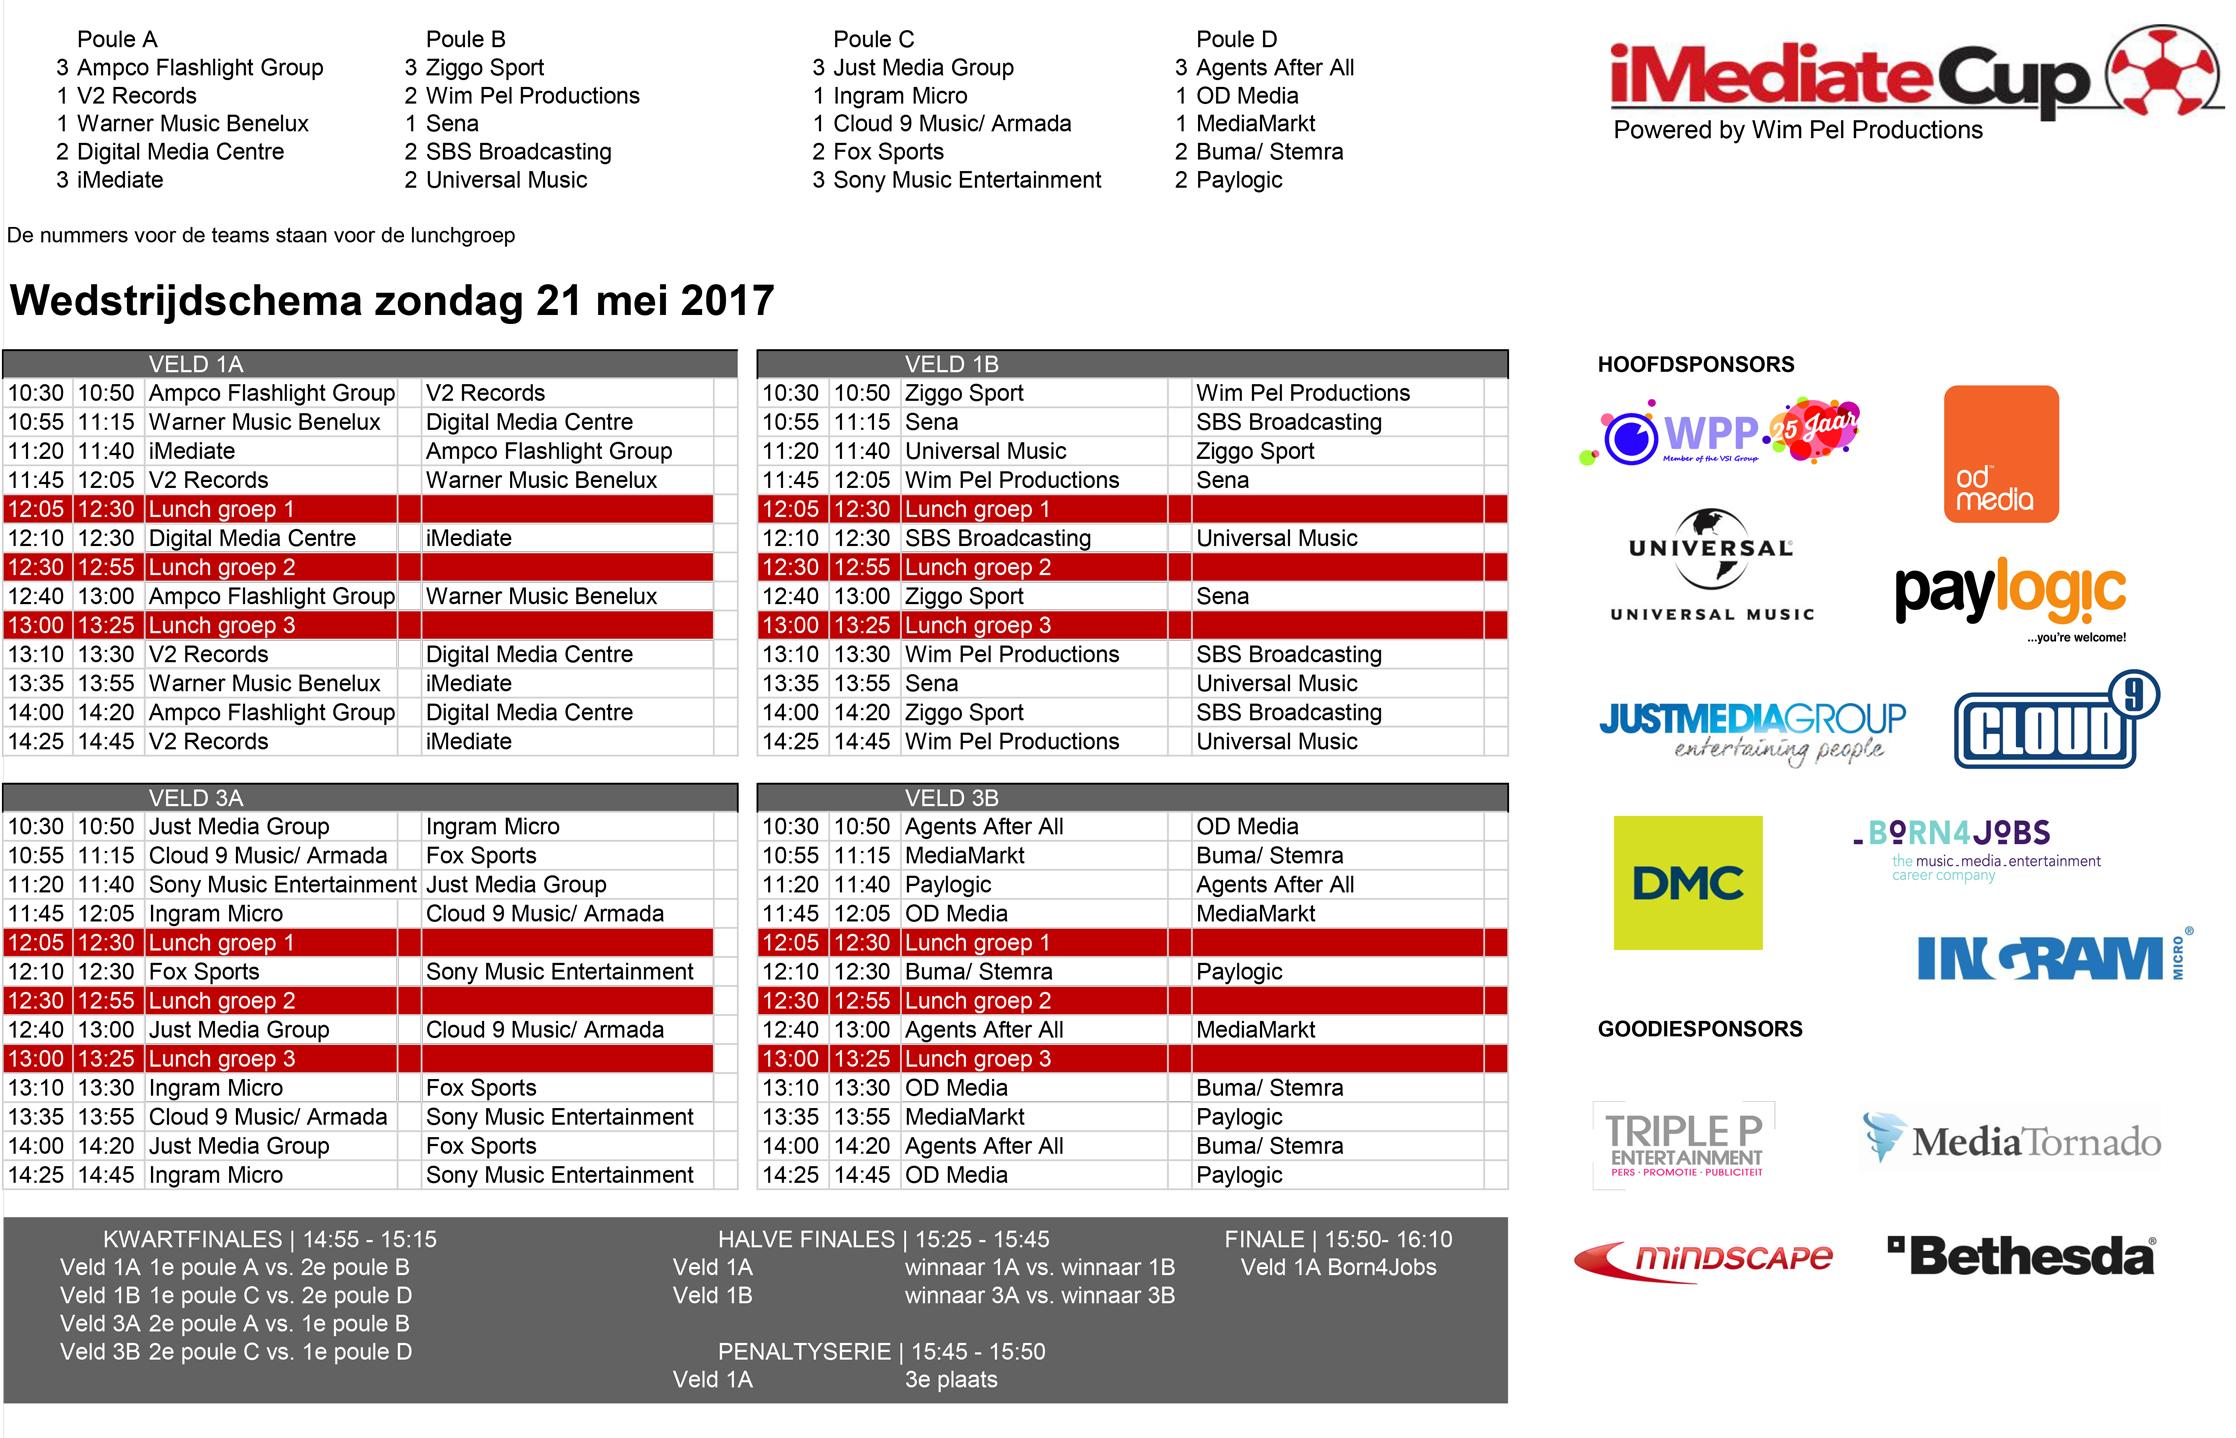 Wedstrijdschema-iMediate-Cup-2017